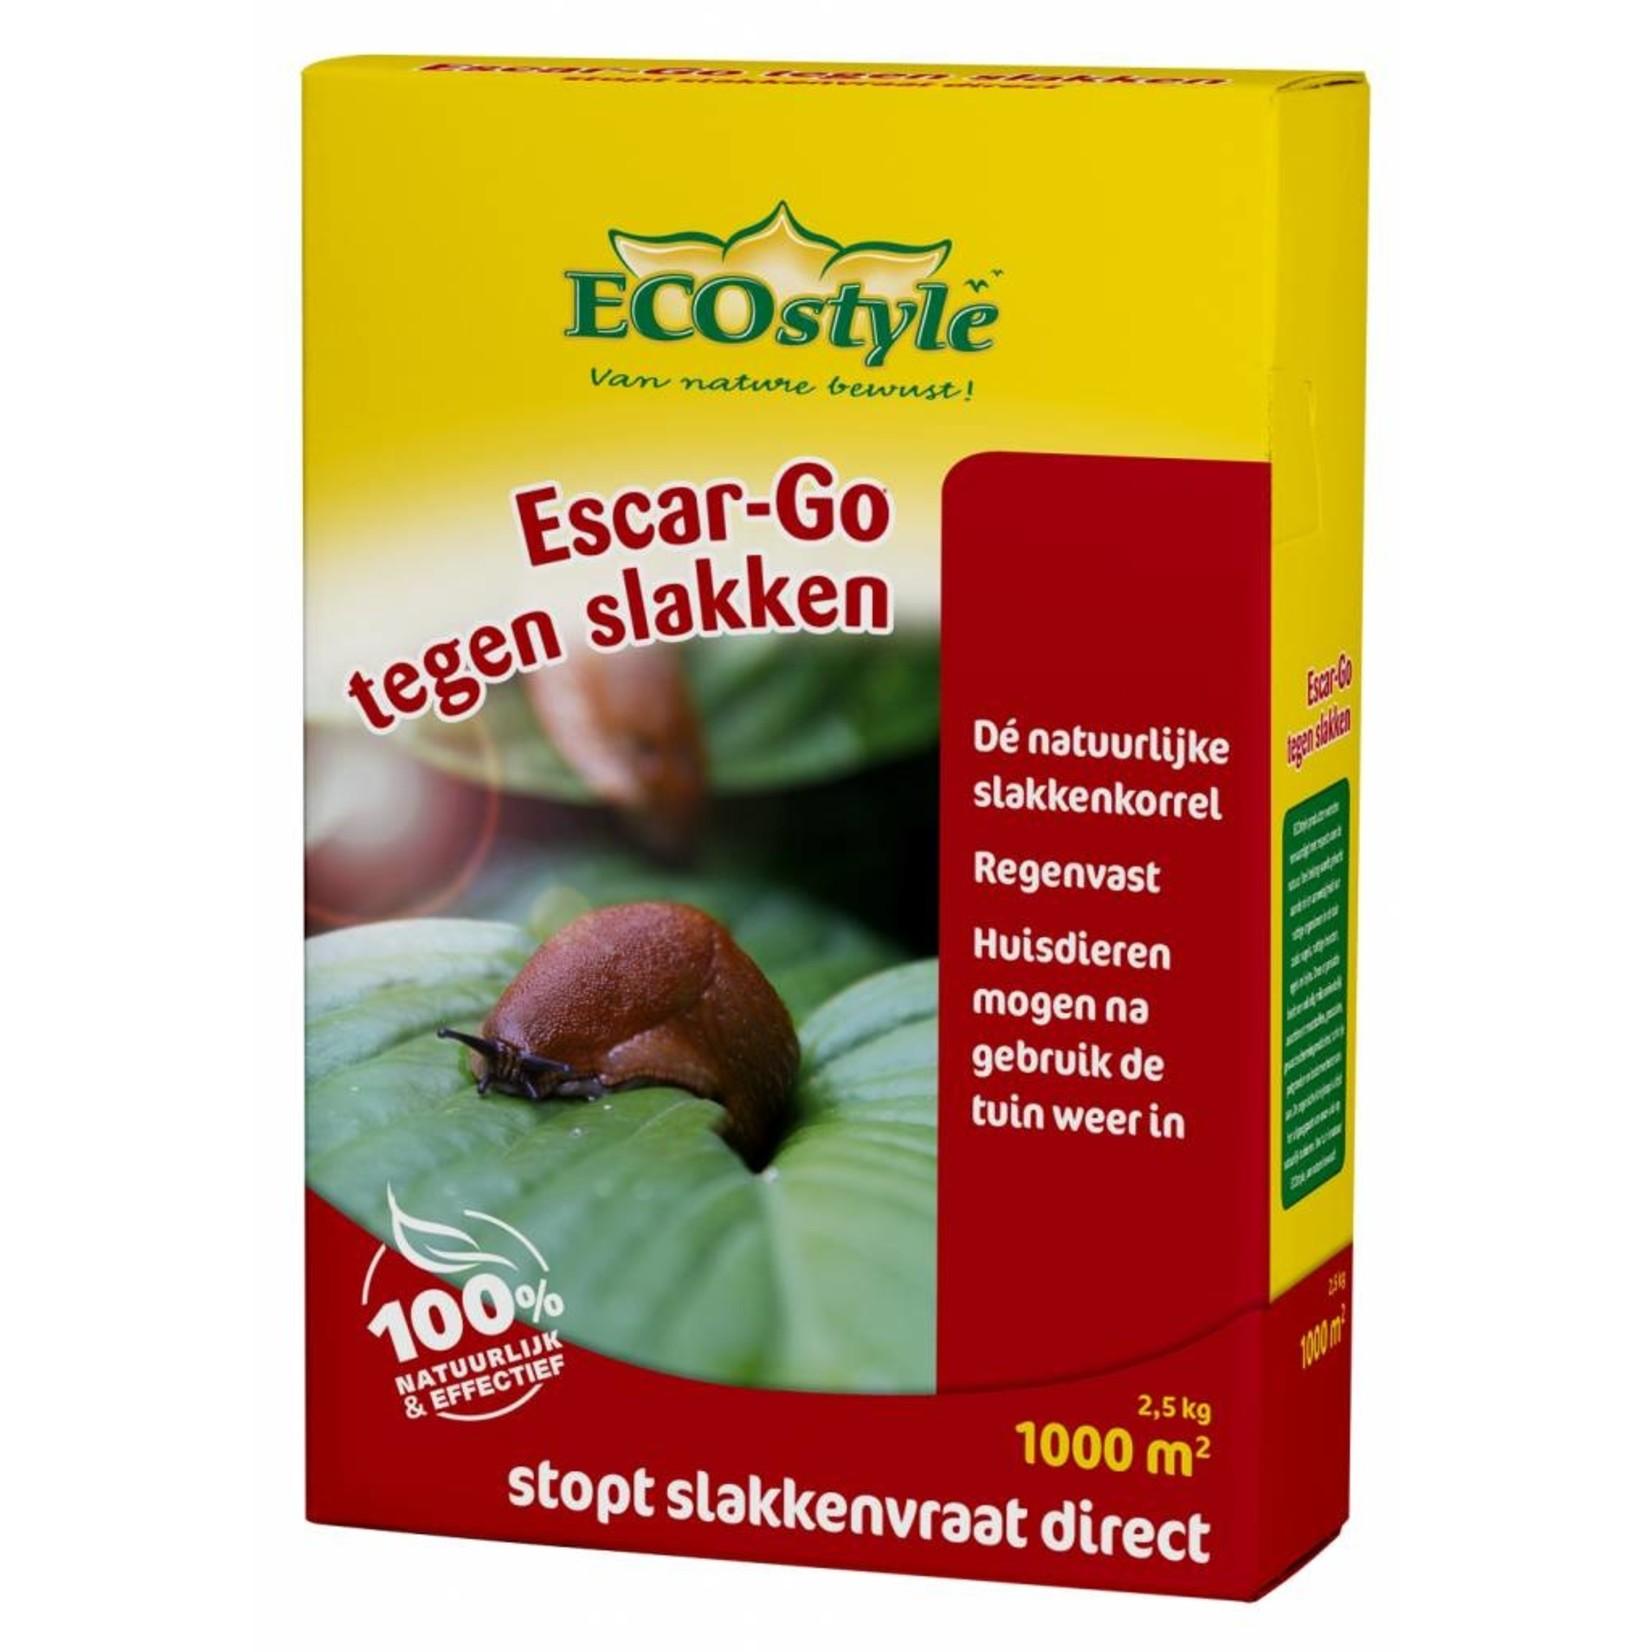 Ecostyle Escar-Go 2.5 kg  tegen slakken (1000 m2)